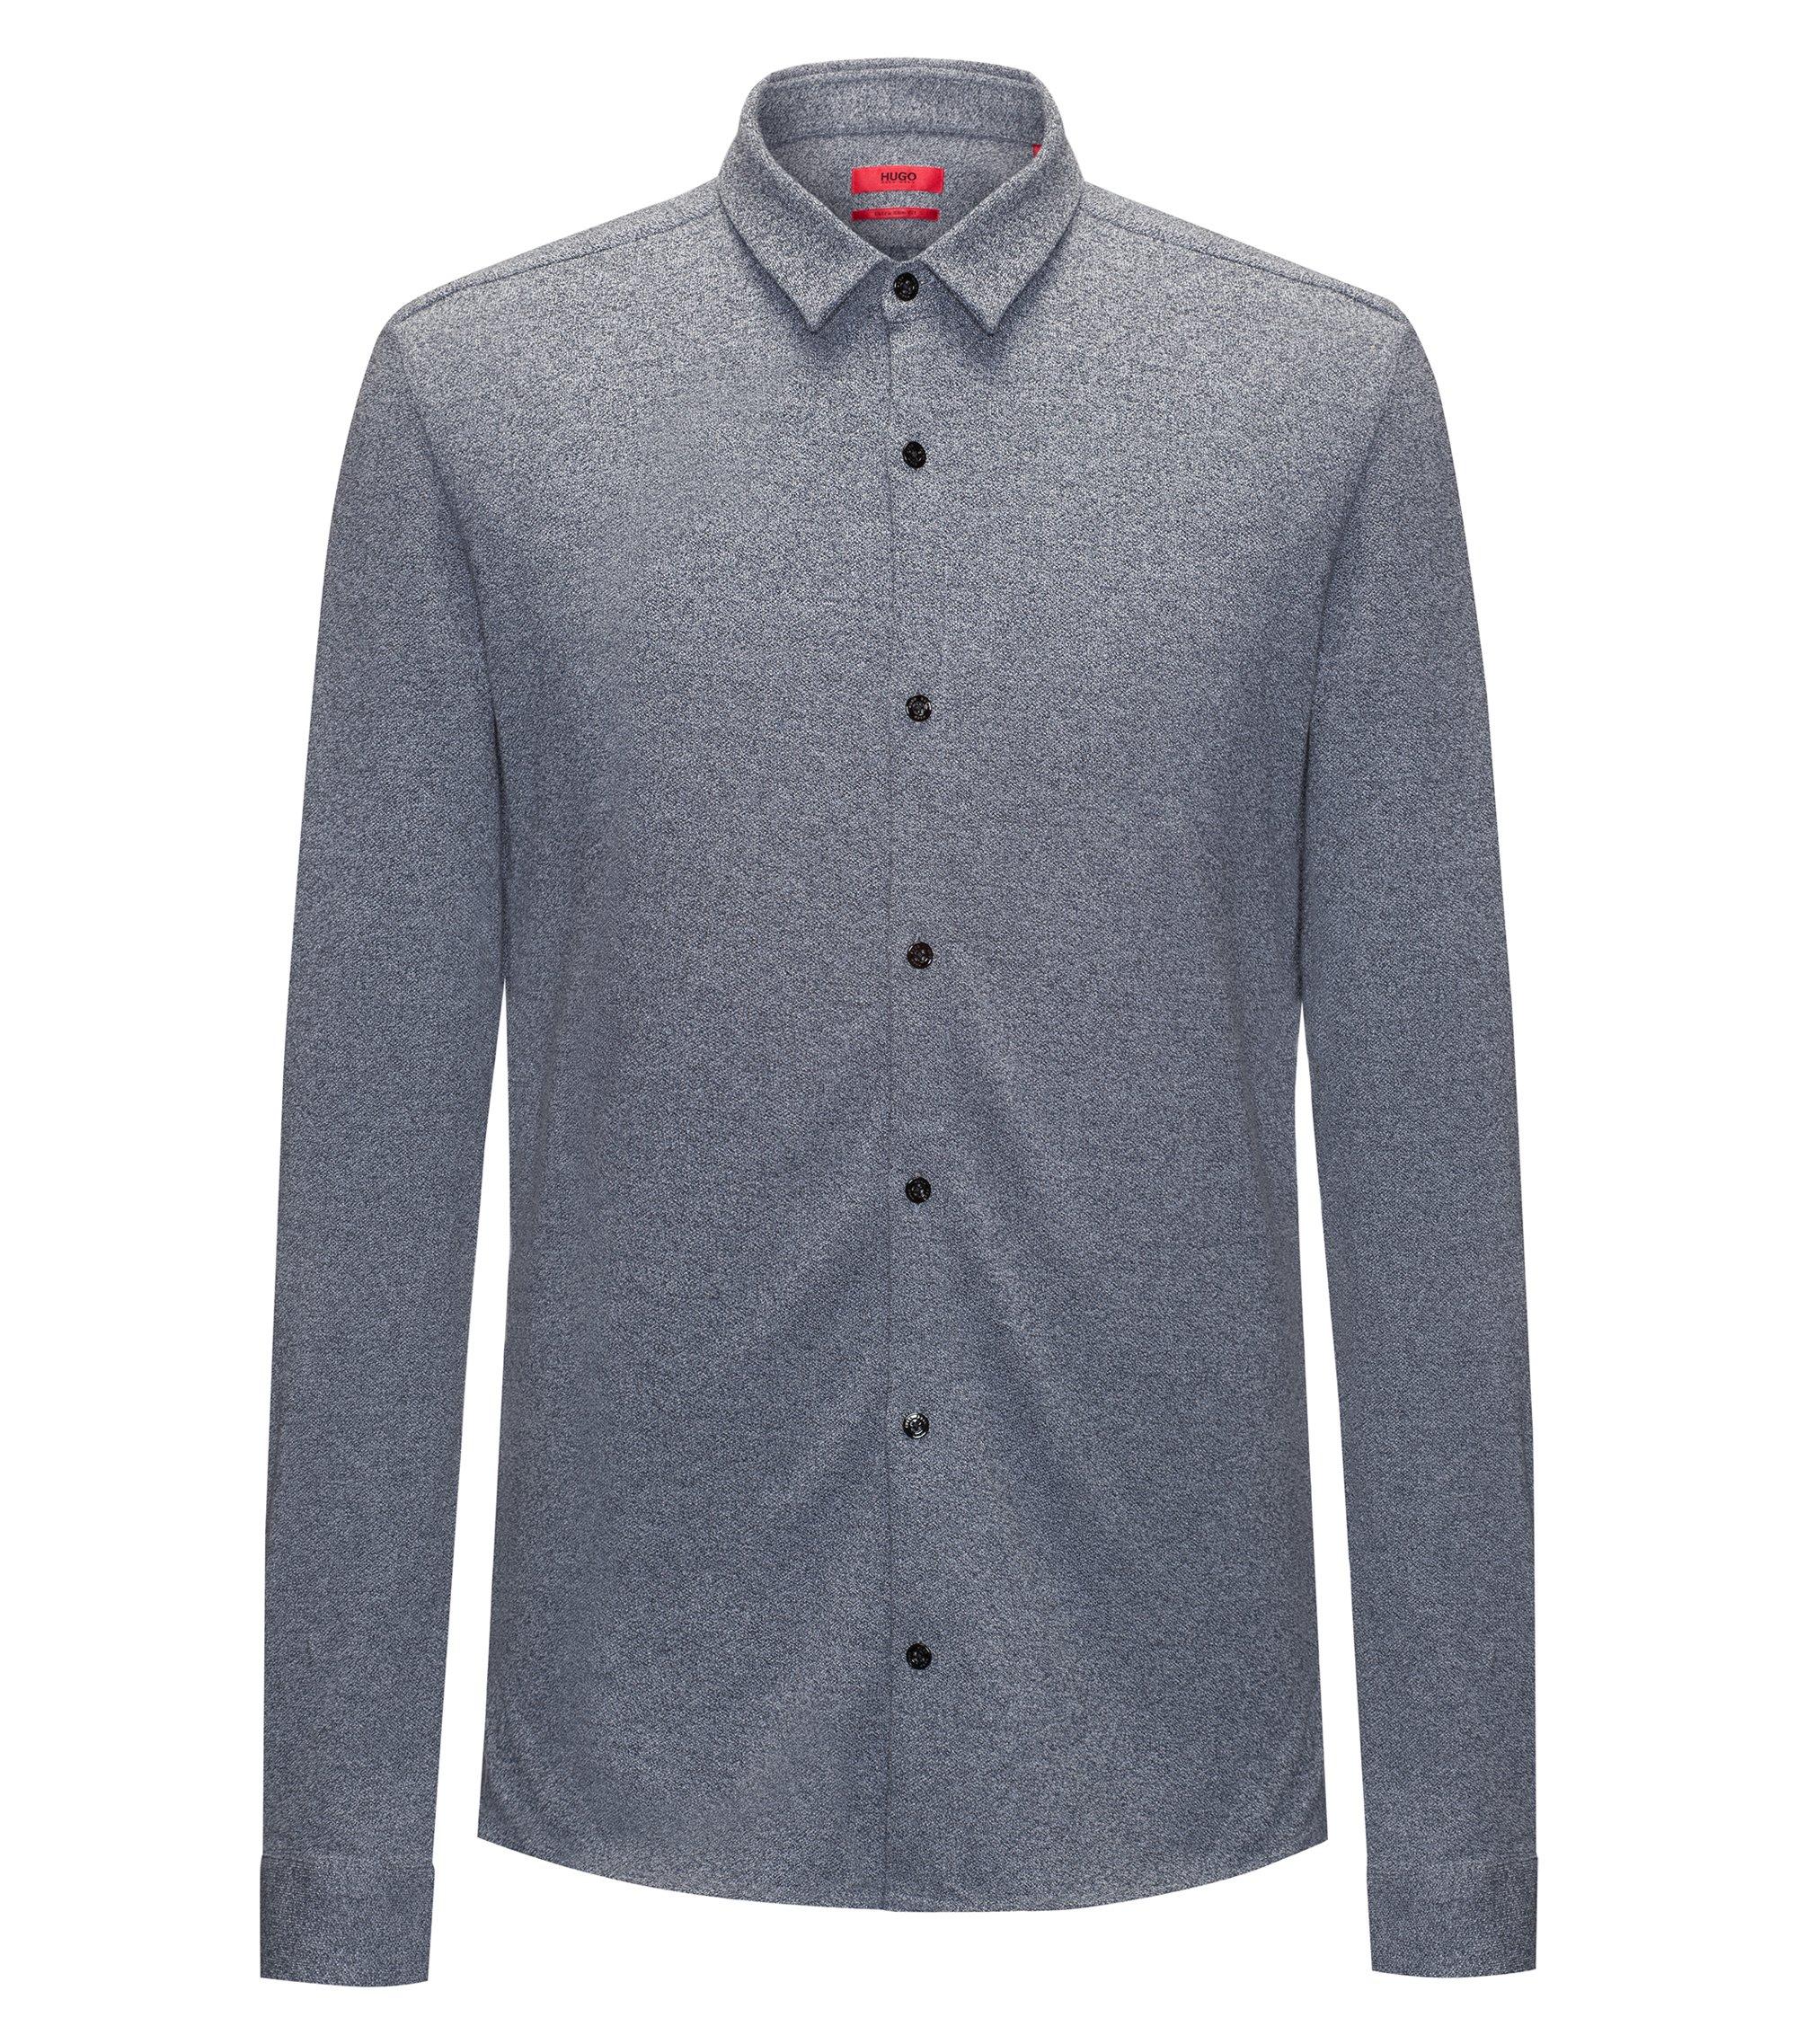 Heathered Cotton Jersey Sport Shirt, Extra Slim Fit   Ero W, Dark Blue